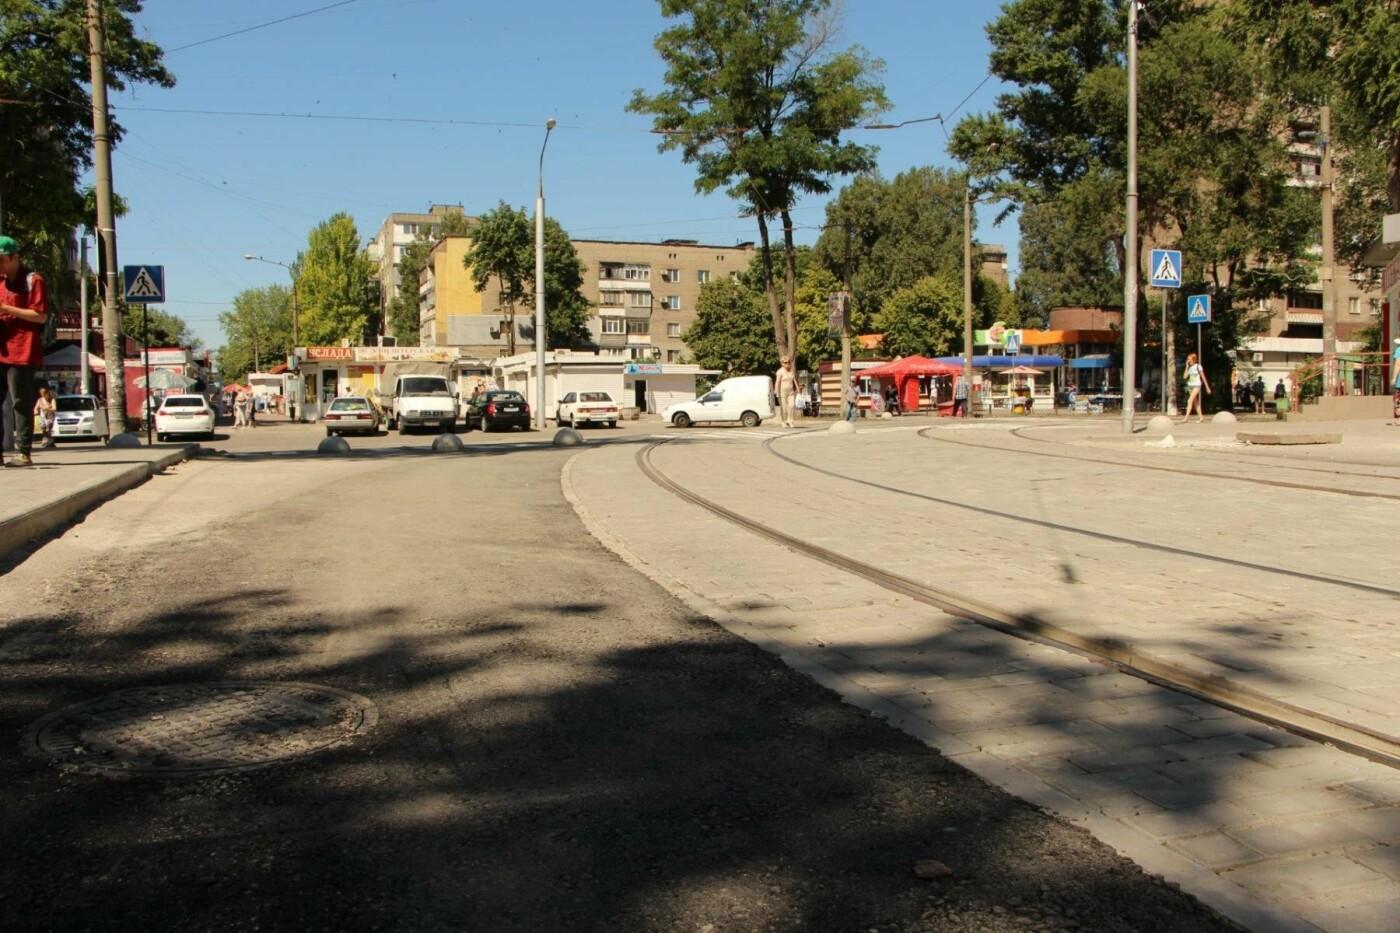 В Запорожье заканчивают ремонт-долгострой трамвайного пути на Кичкасе, – ФОТО, фото-1